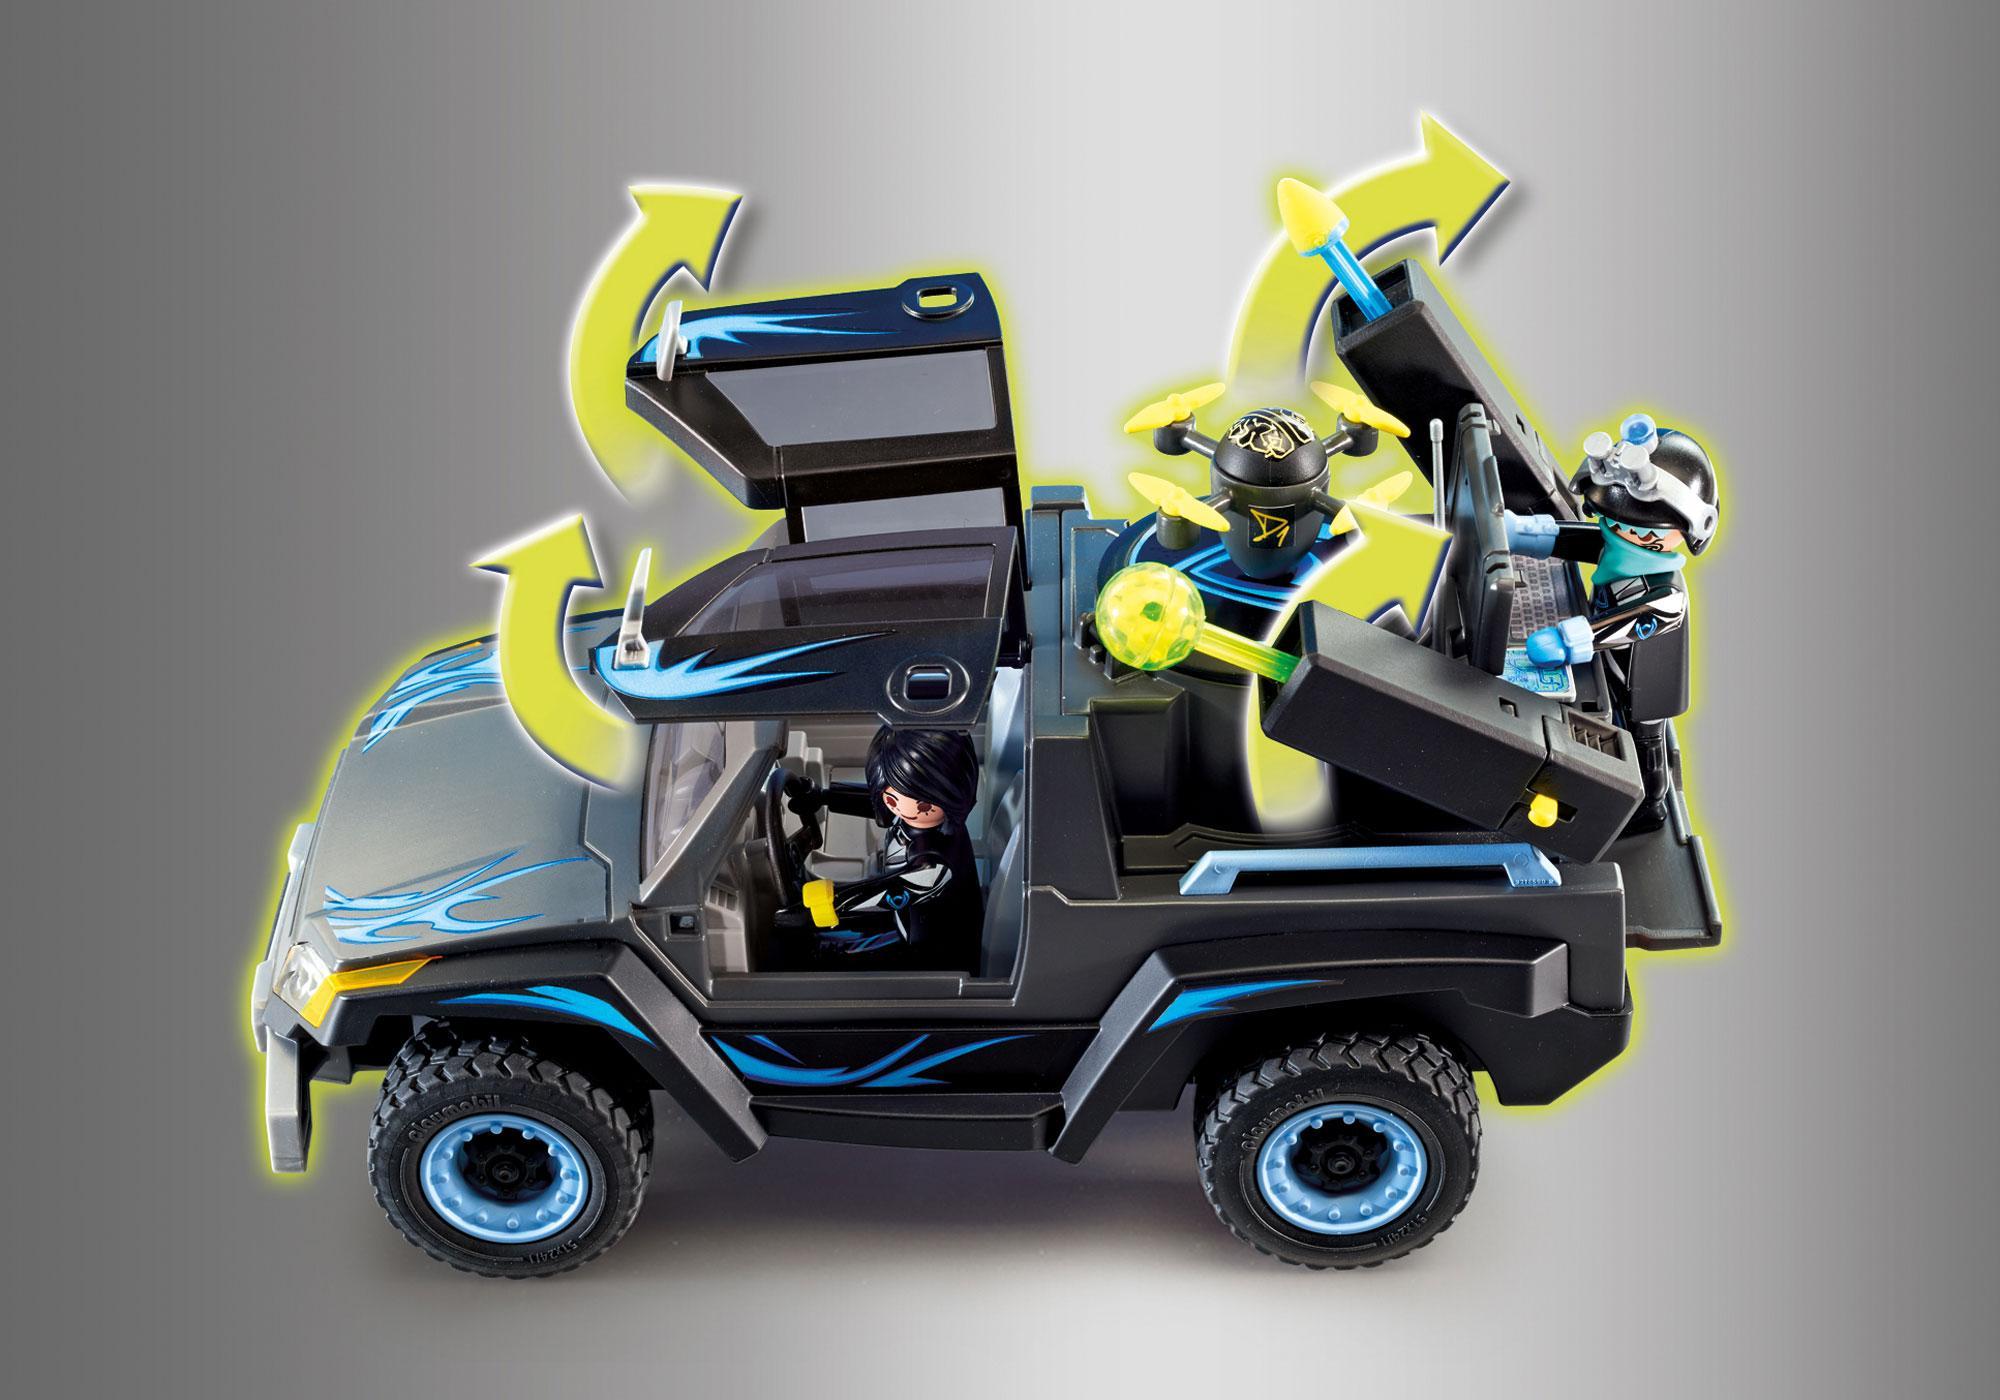 http://media.playmobil.com/i/playmobil/9254_product_extra3/Dr. Drone Pick-up